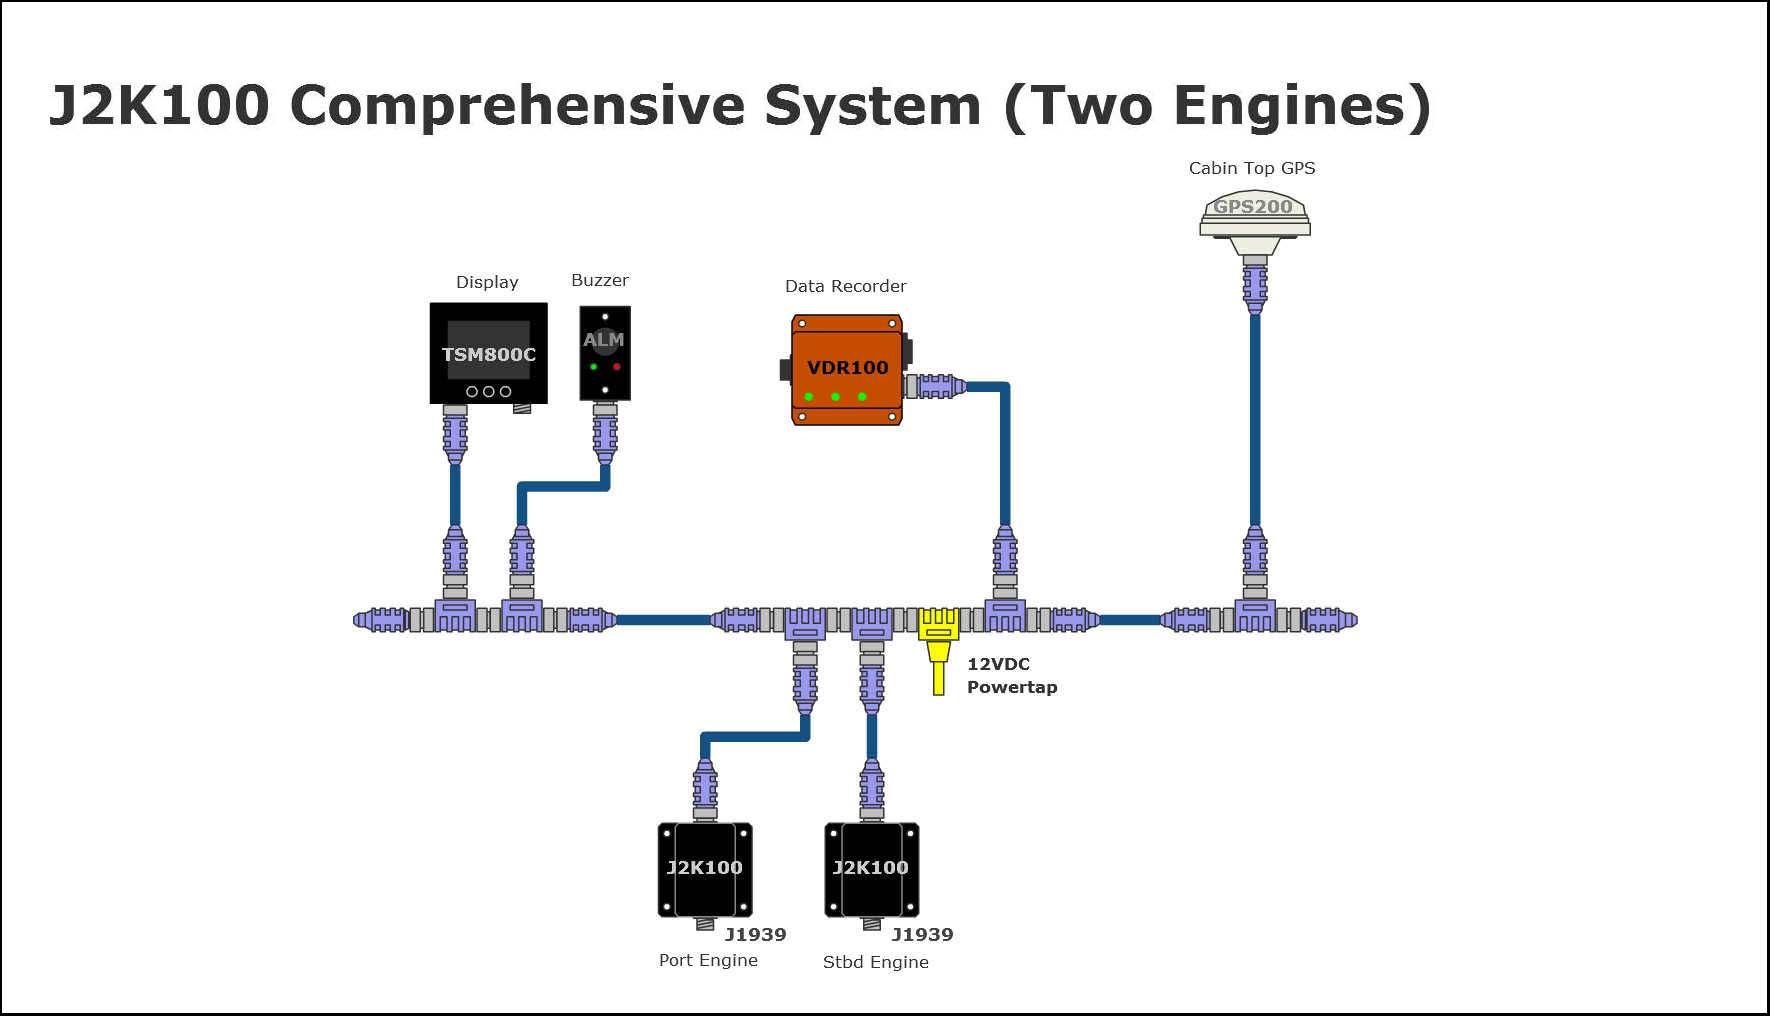 Maretron J1939 To Nmea 2000 Engine Monitoring Gateway J2k100 Yanmar 2gm Wiring Diagram Comprehensive System Two Engines